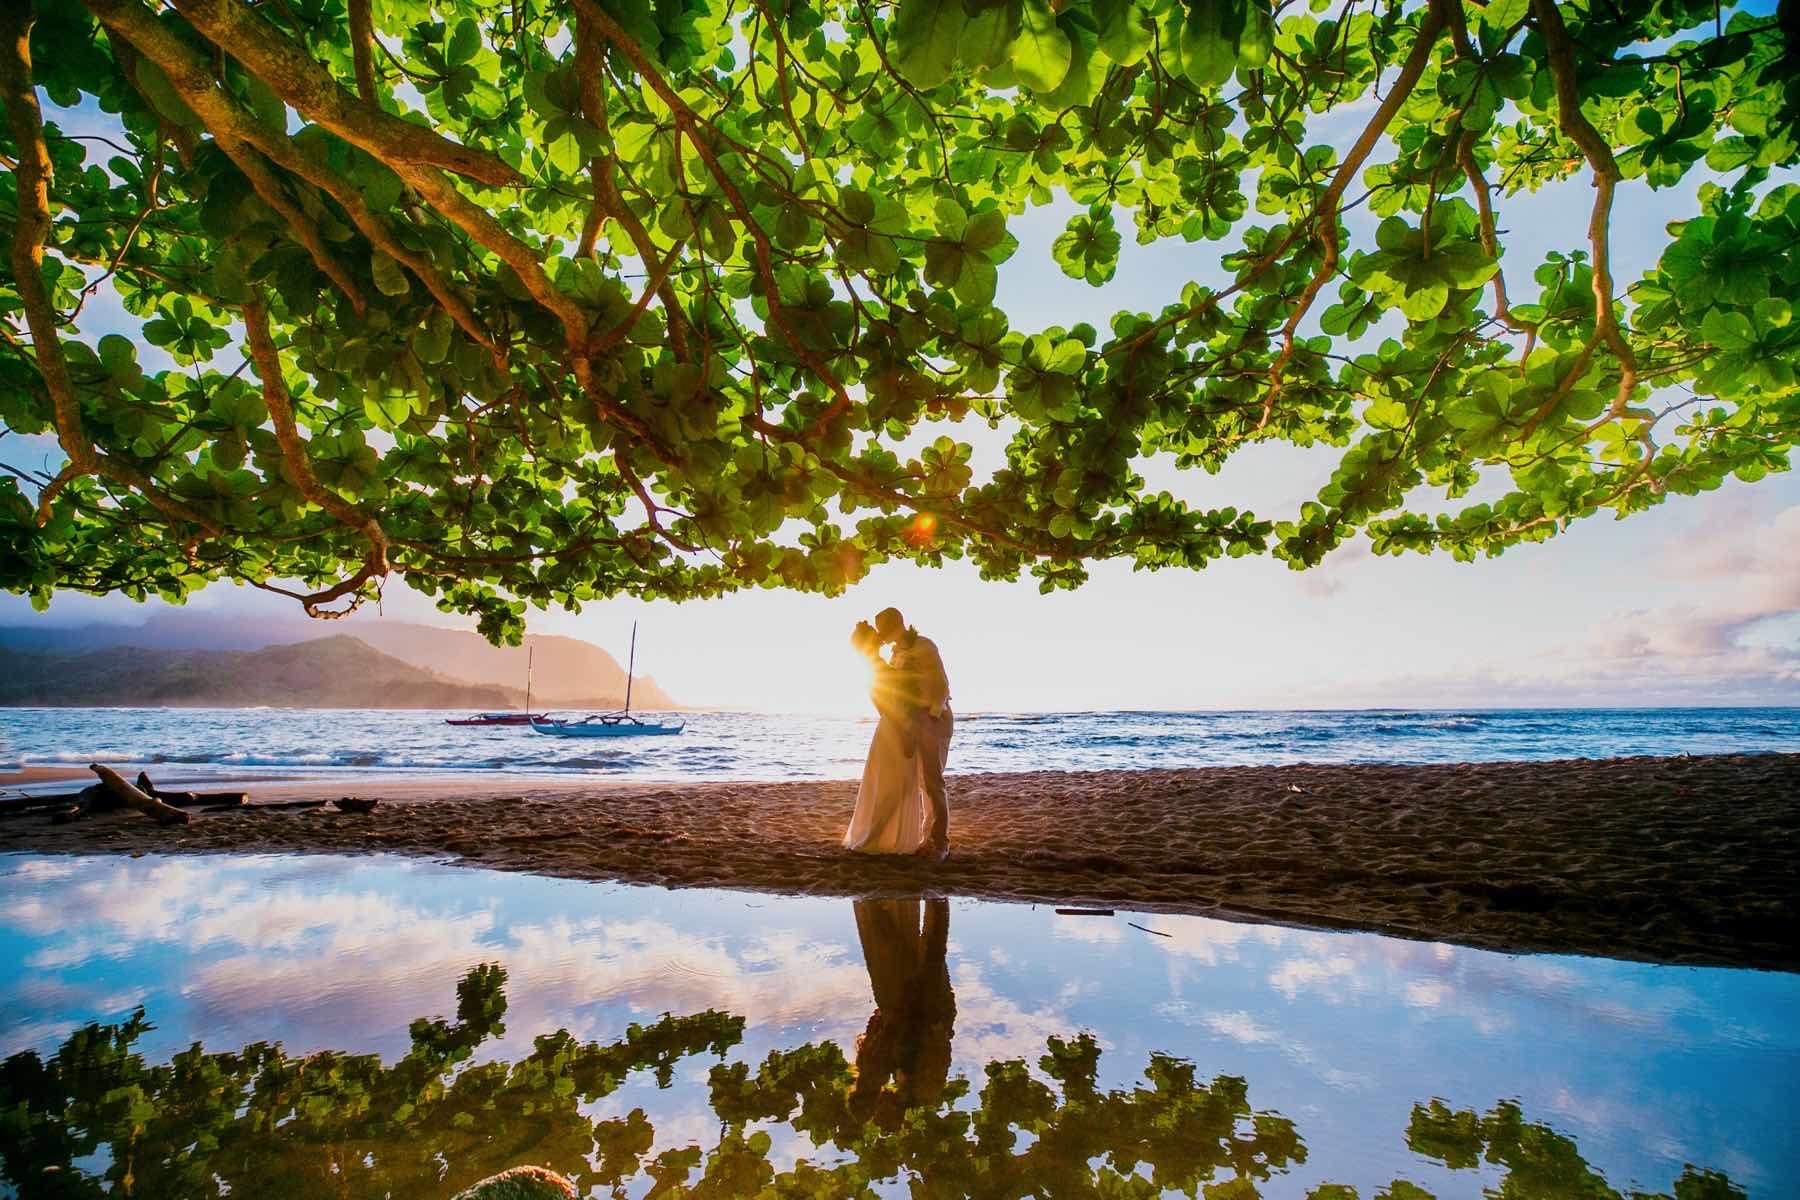 Jessica & Ryan on the beach in Kauai.